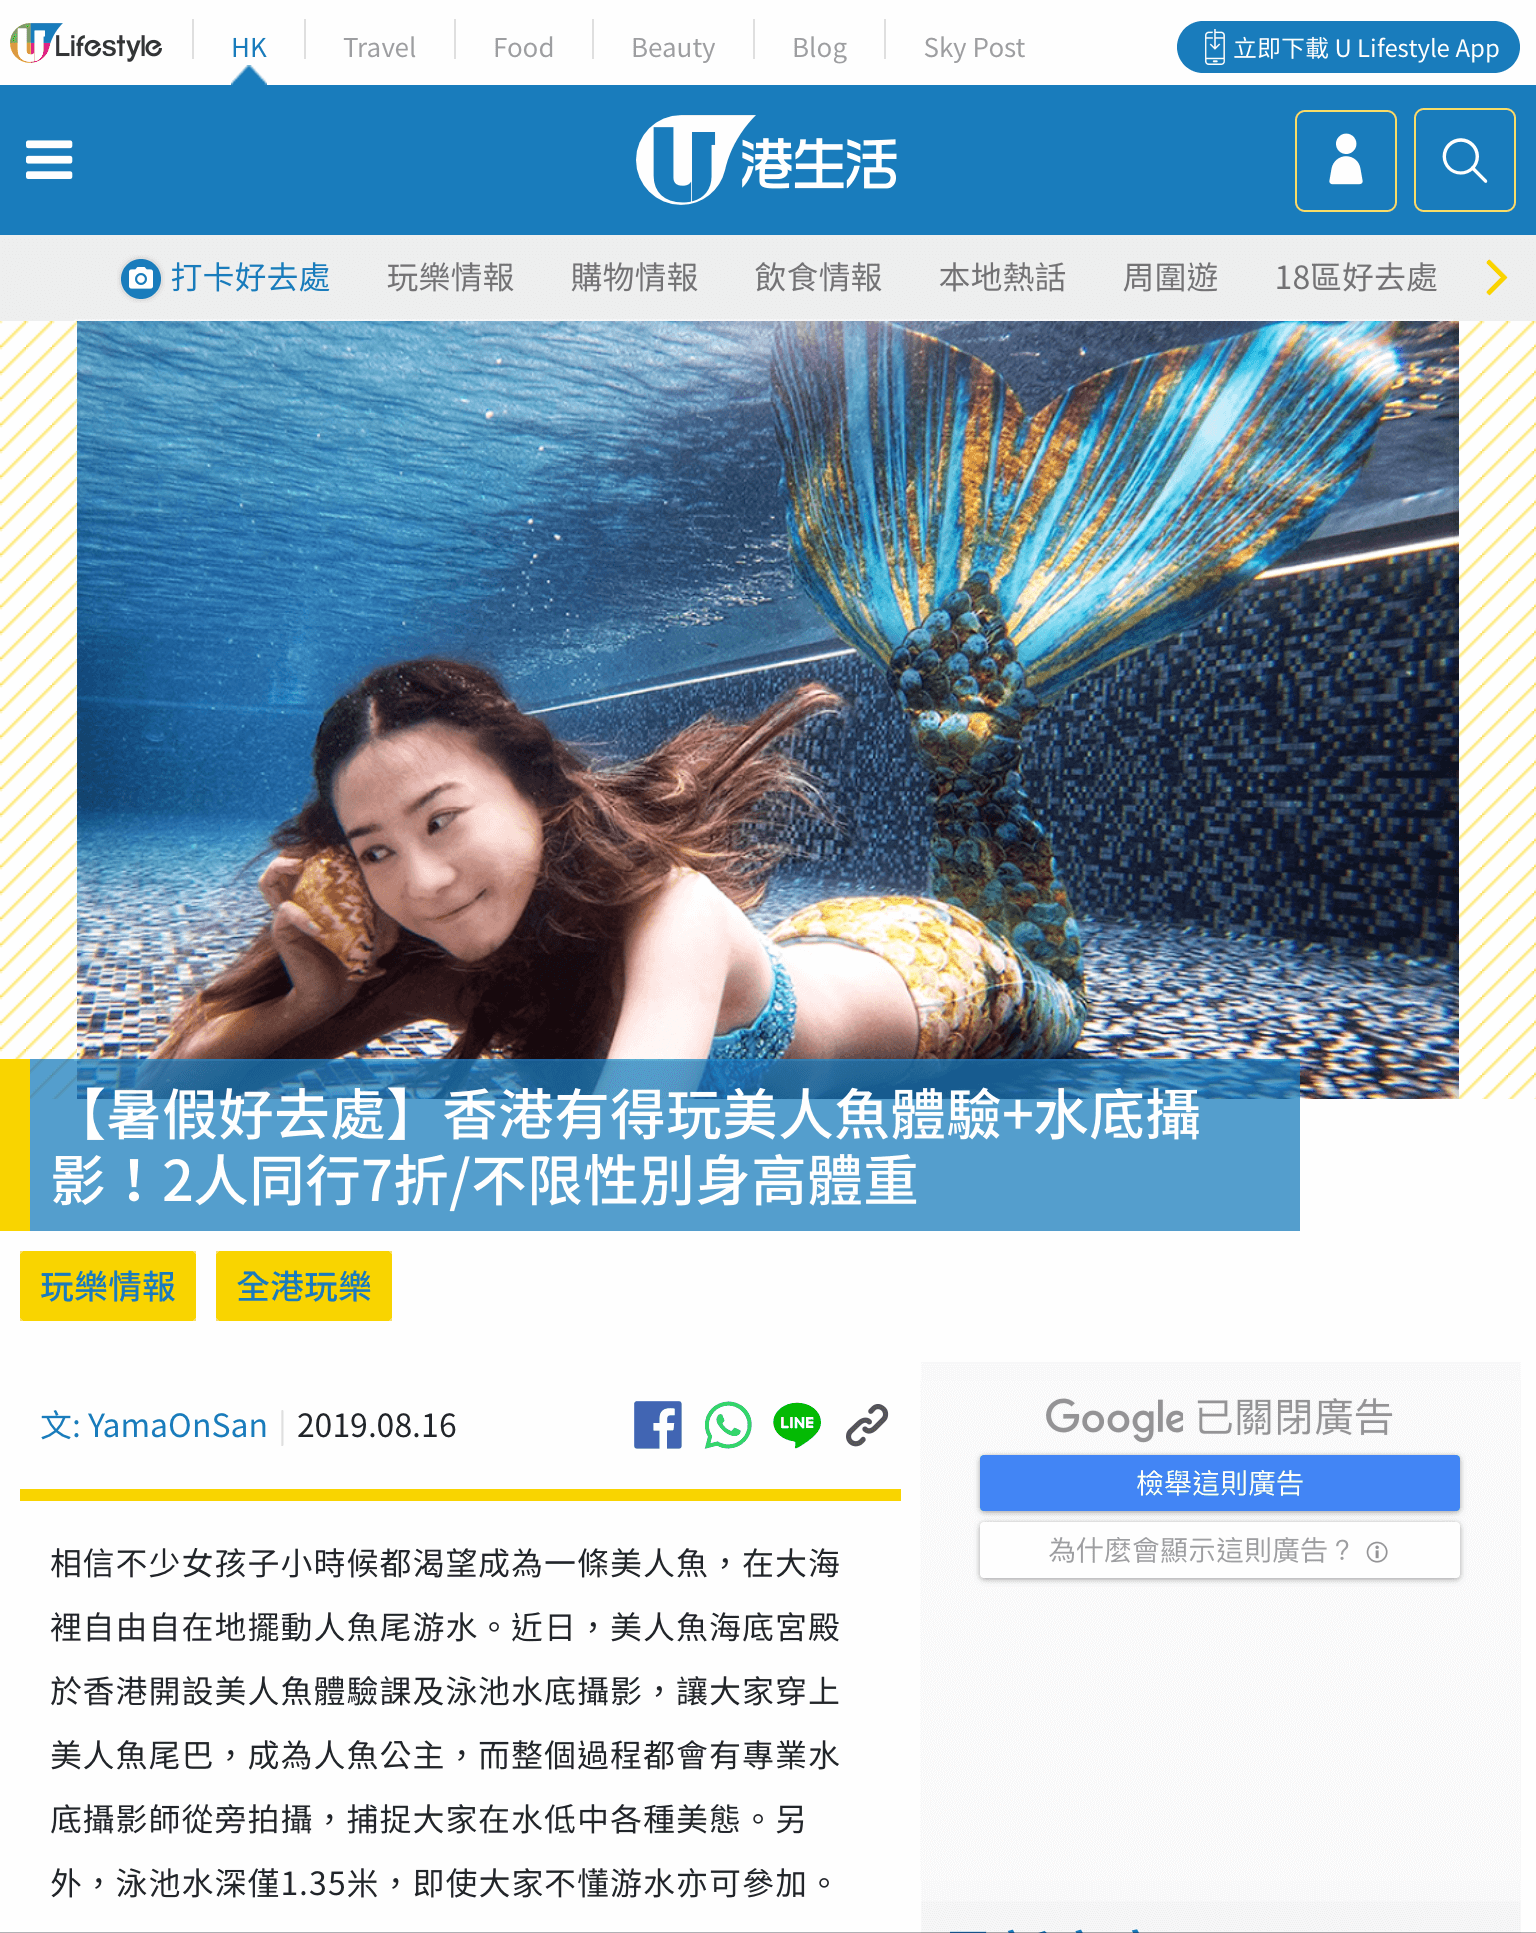 [U Lifestyle港生活] 香港有得玩美人鱼体验+水底摄影!